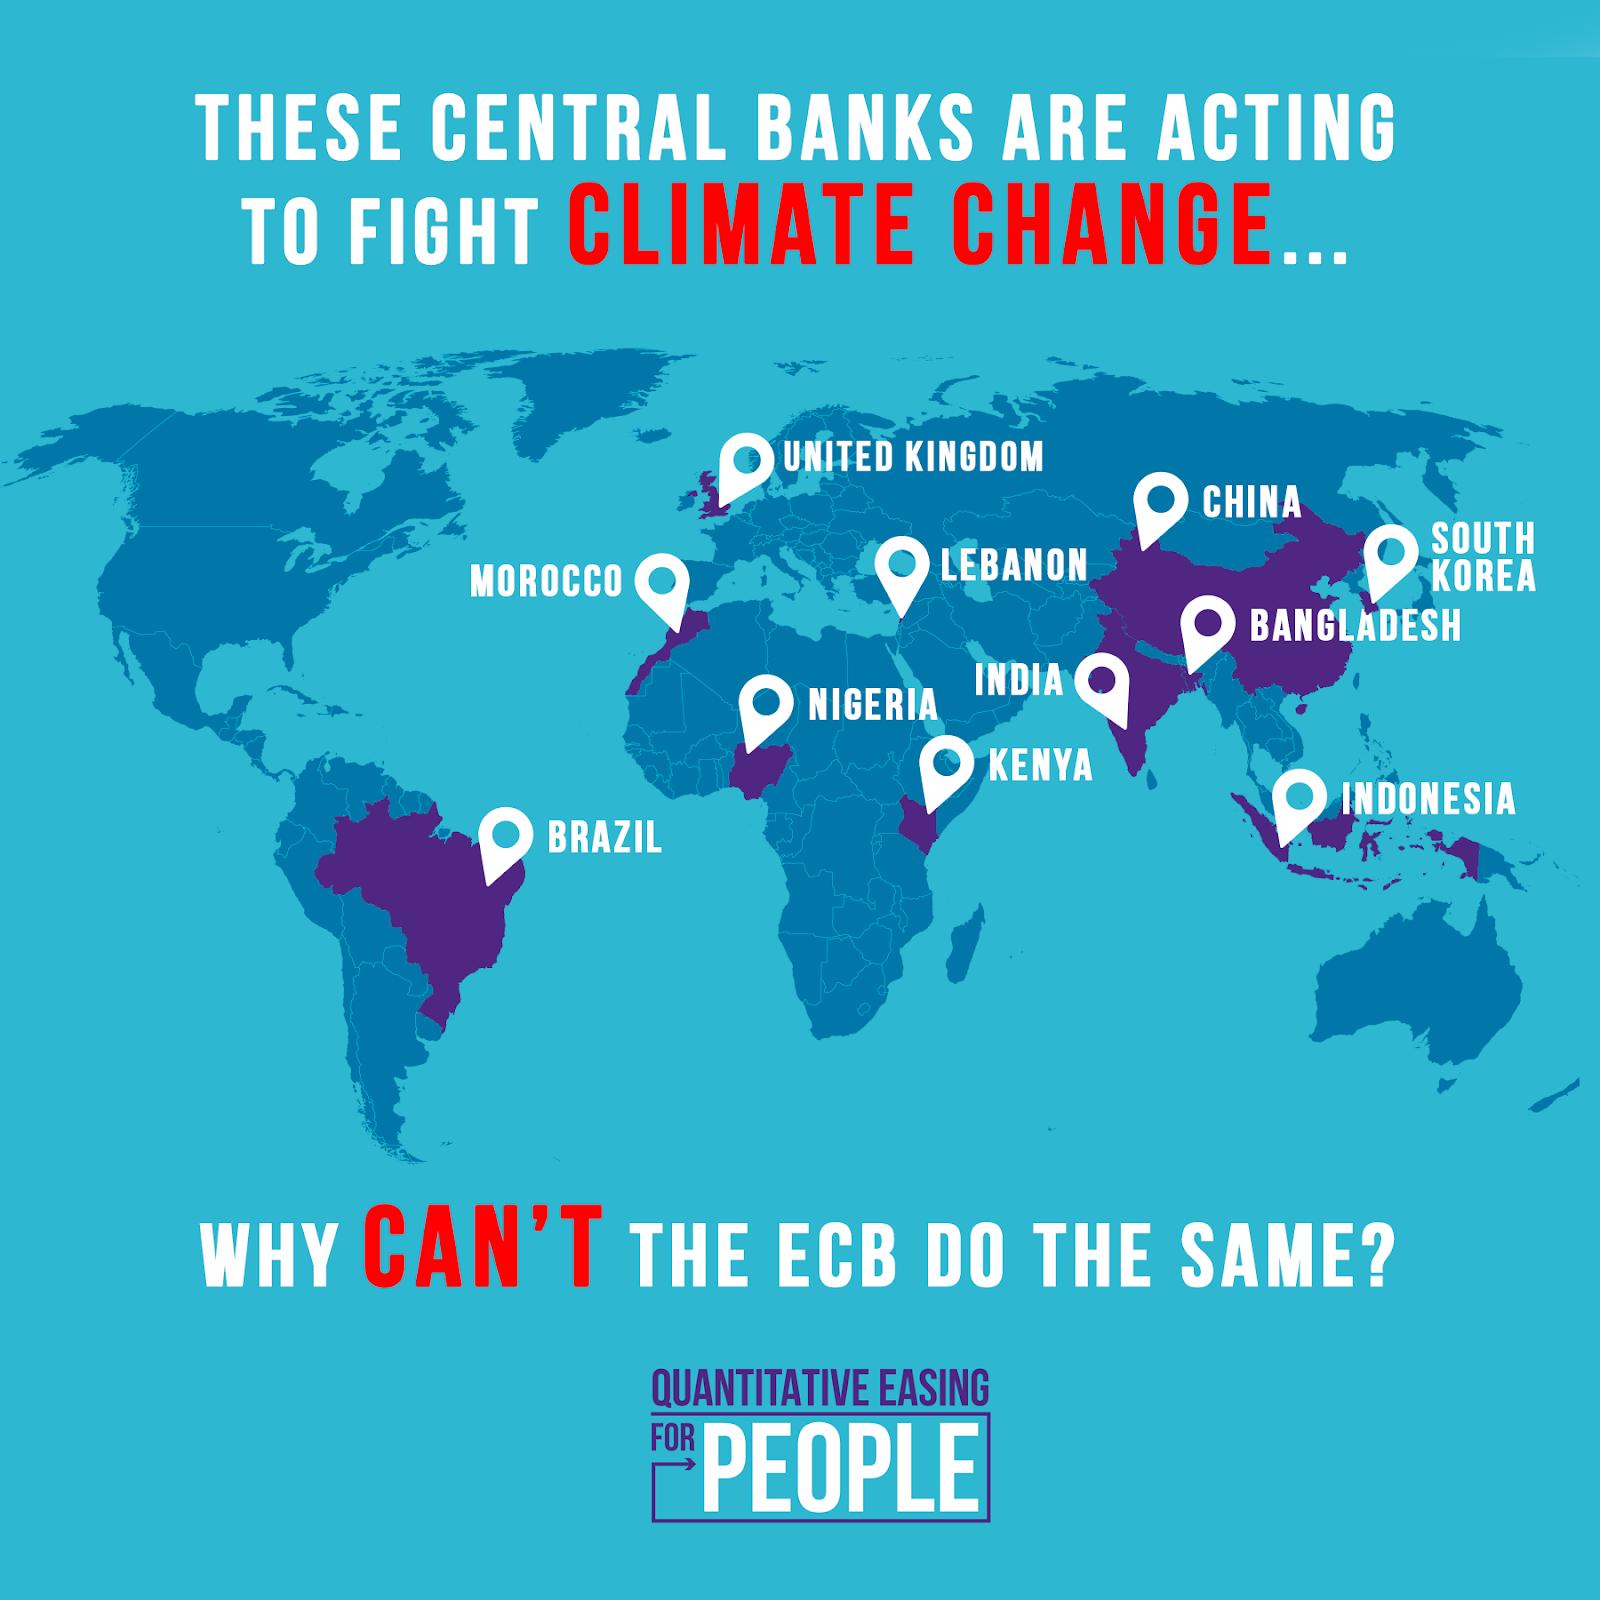 Seven central banks leading on climate change